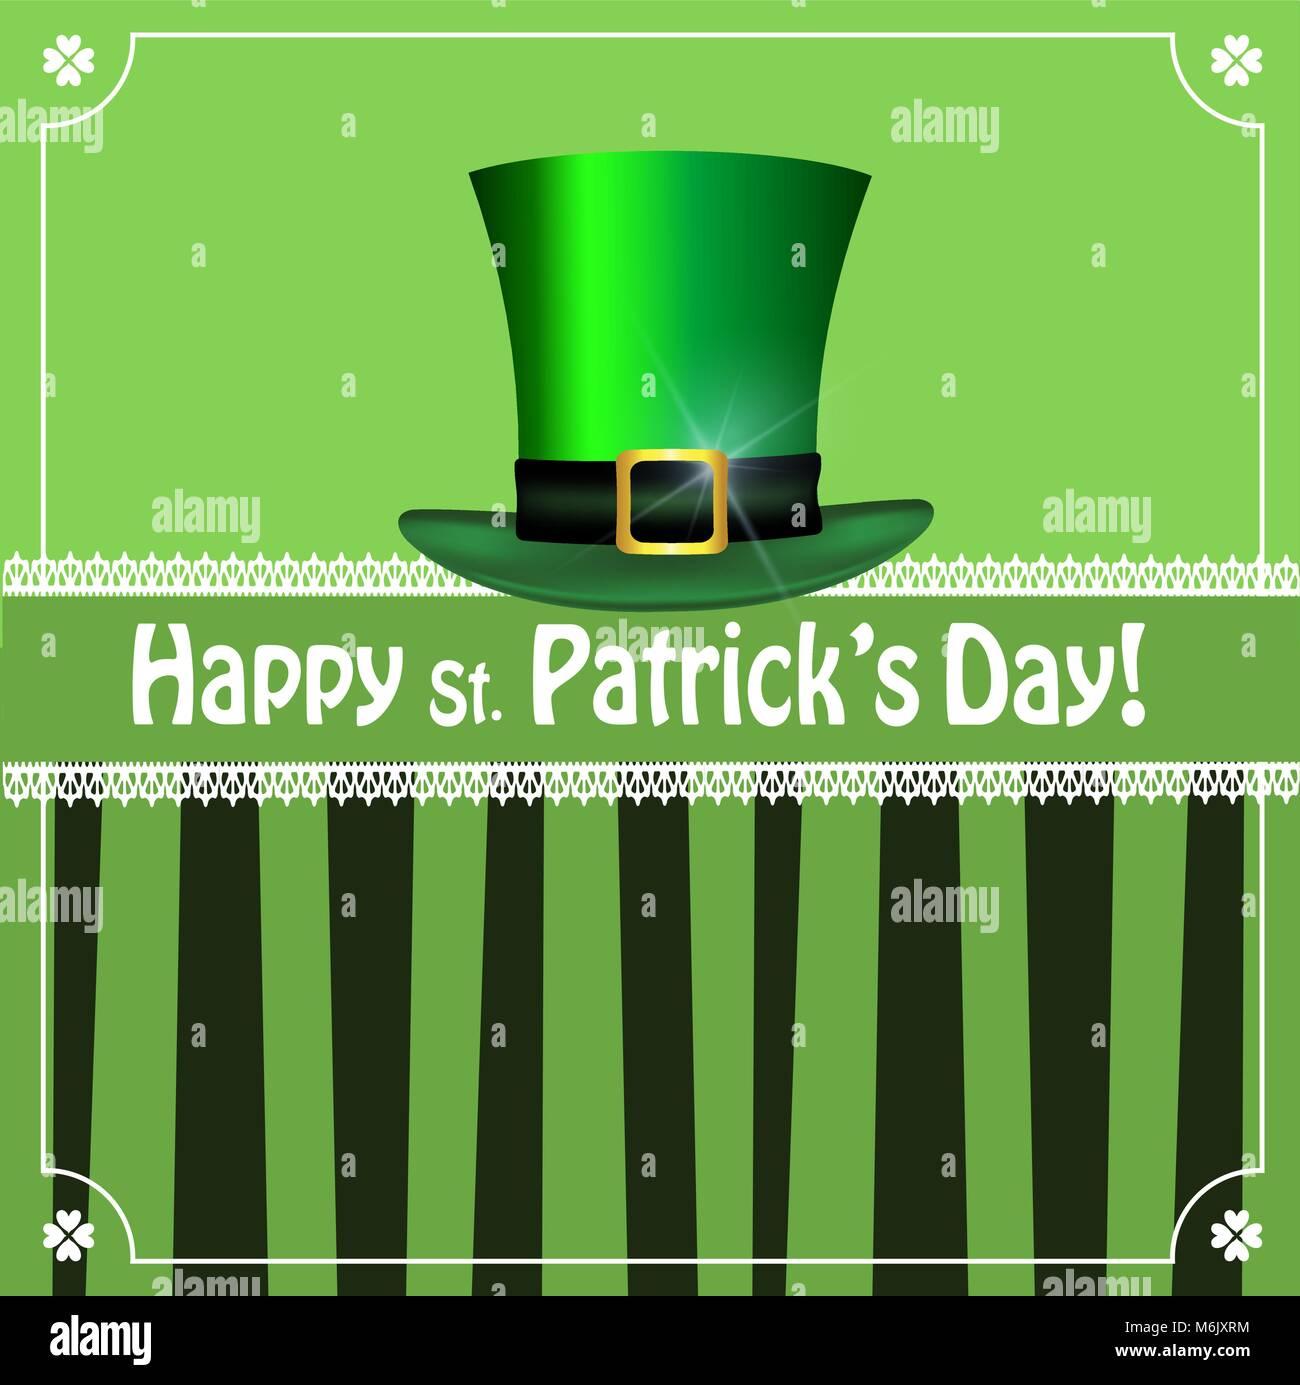 St Patricks Day Border Shamrocks Imágenes De Stock & St Patricks Day ...